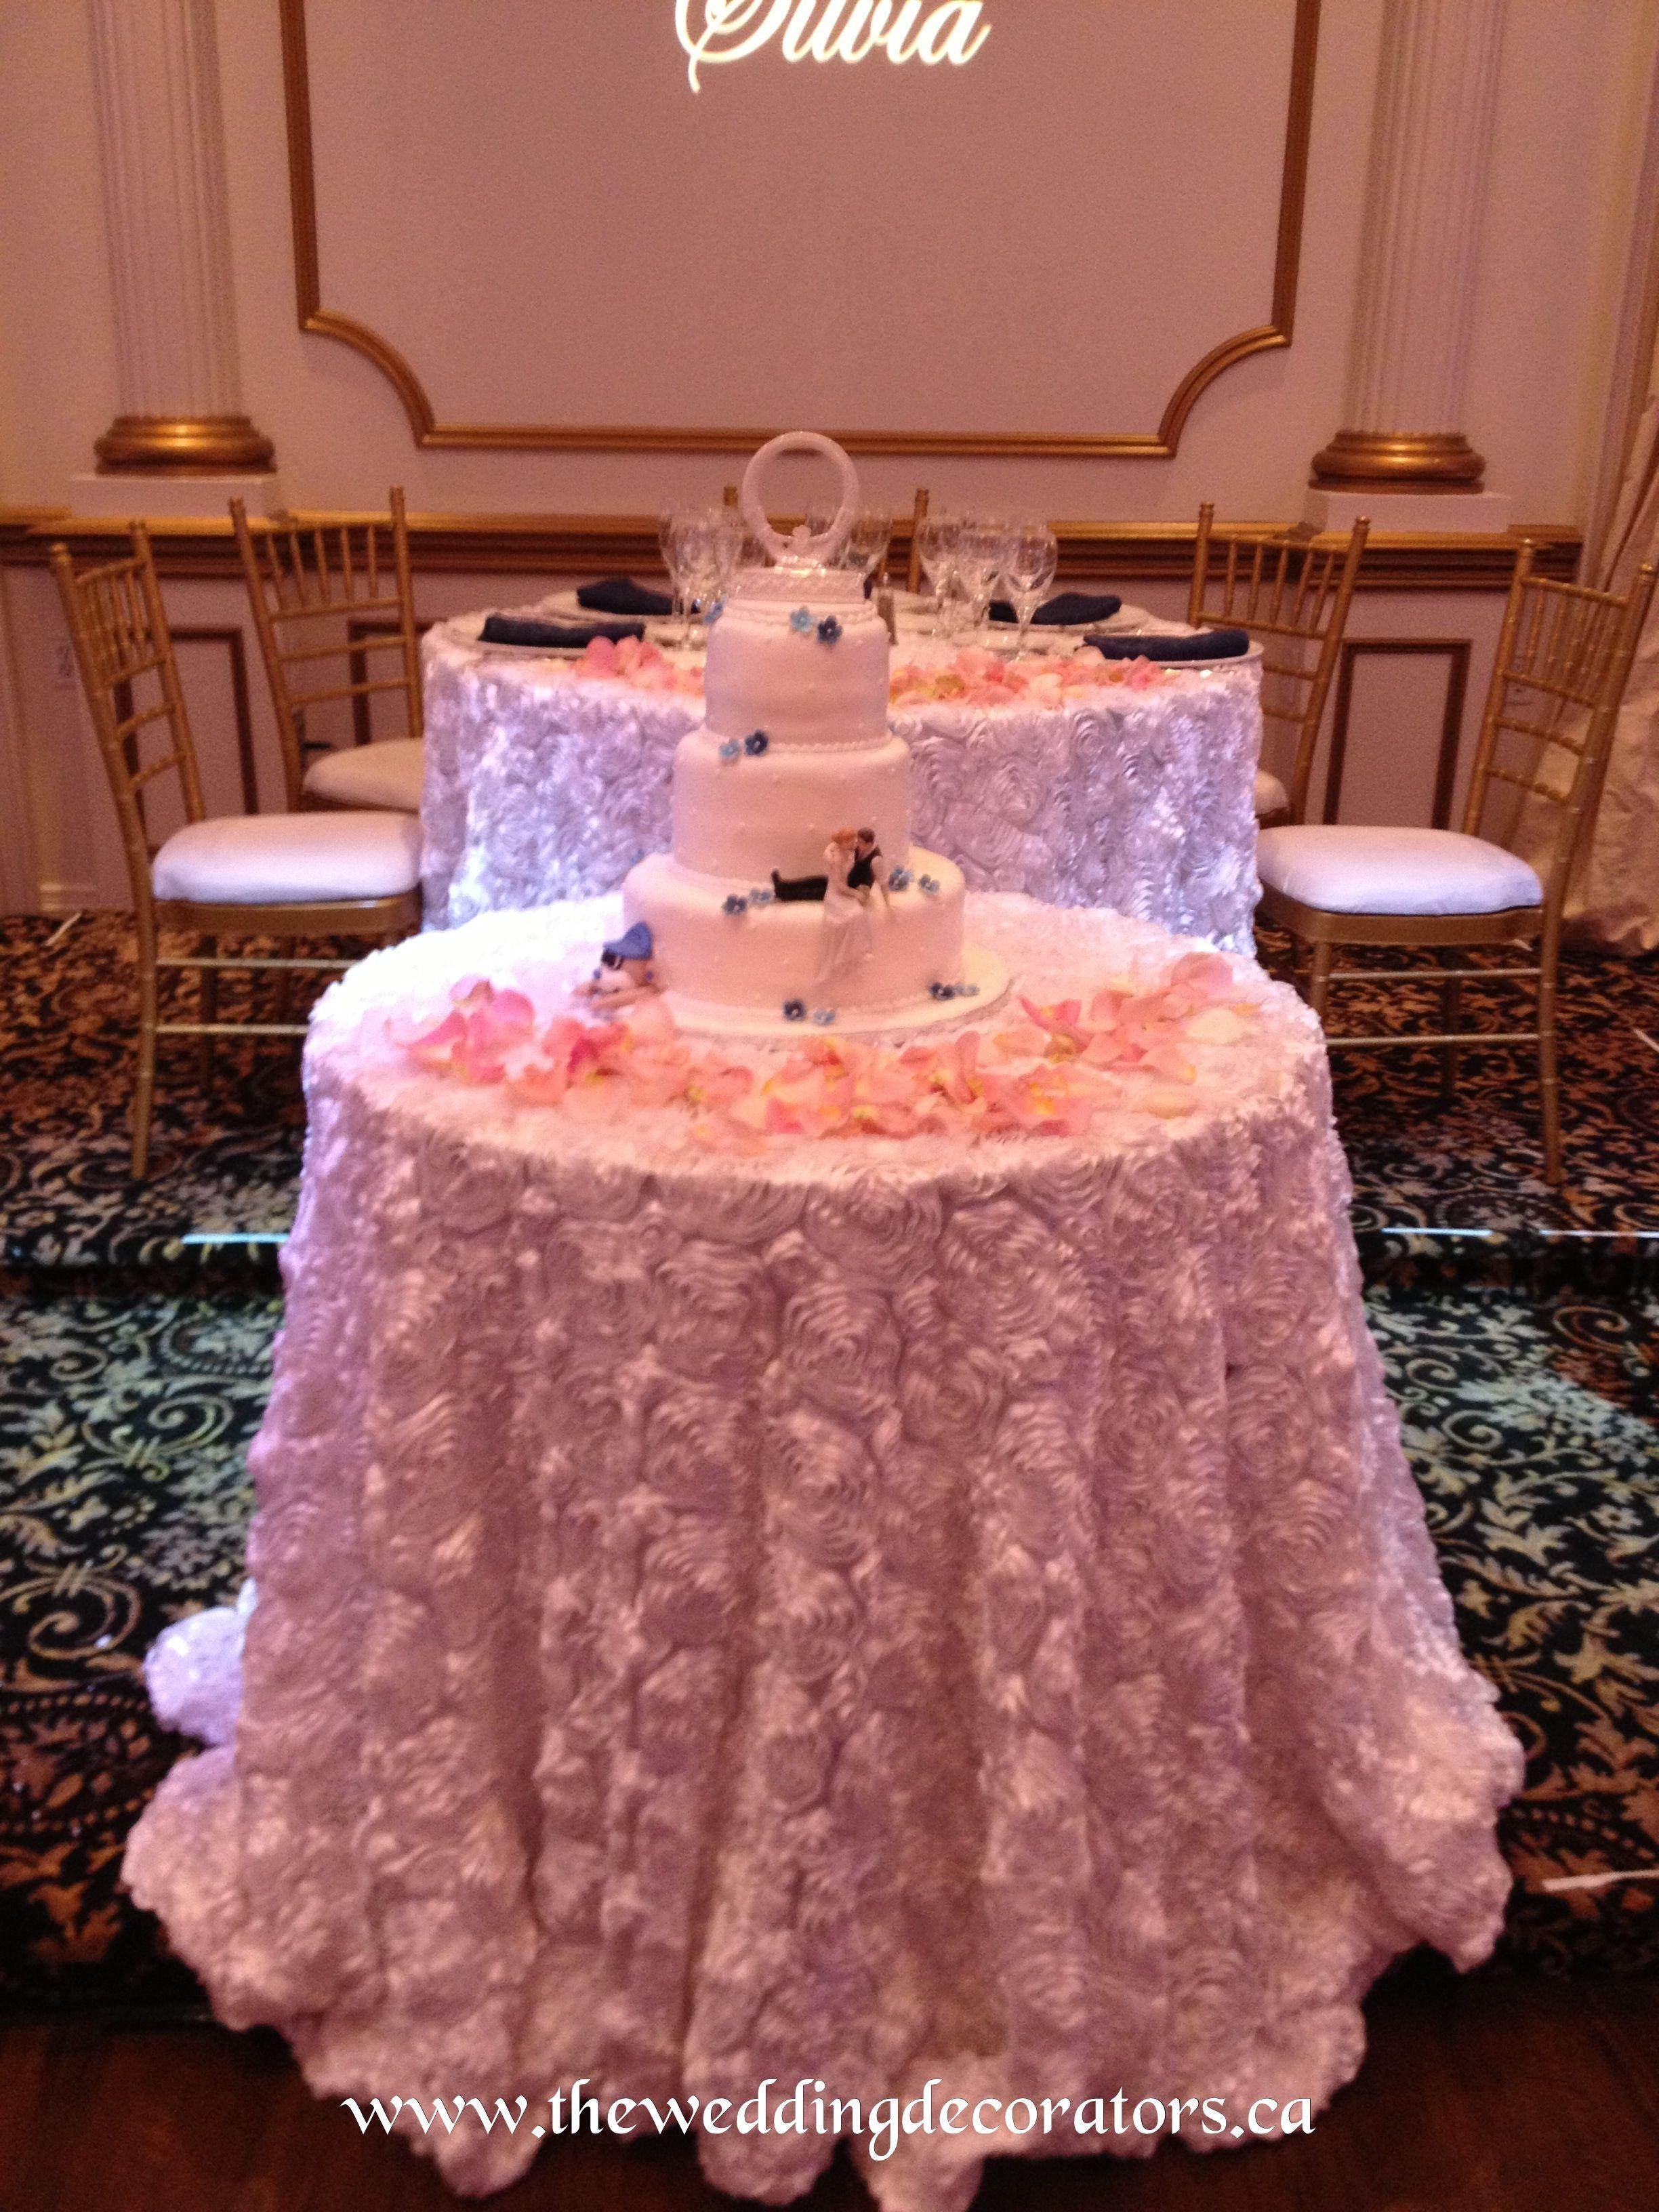 Reception head table & cake table linens. White rosette. | Wedding ...